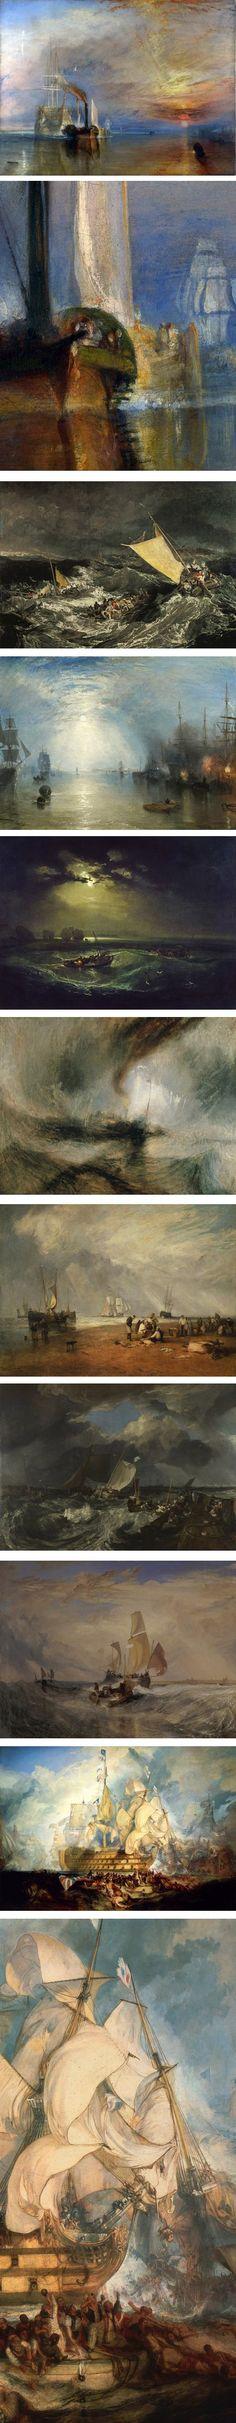 Turner & the Sea, JMW Turner at Maritime Museum